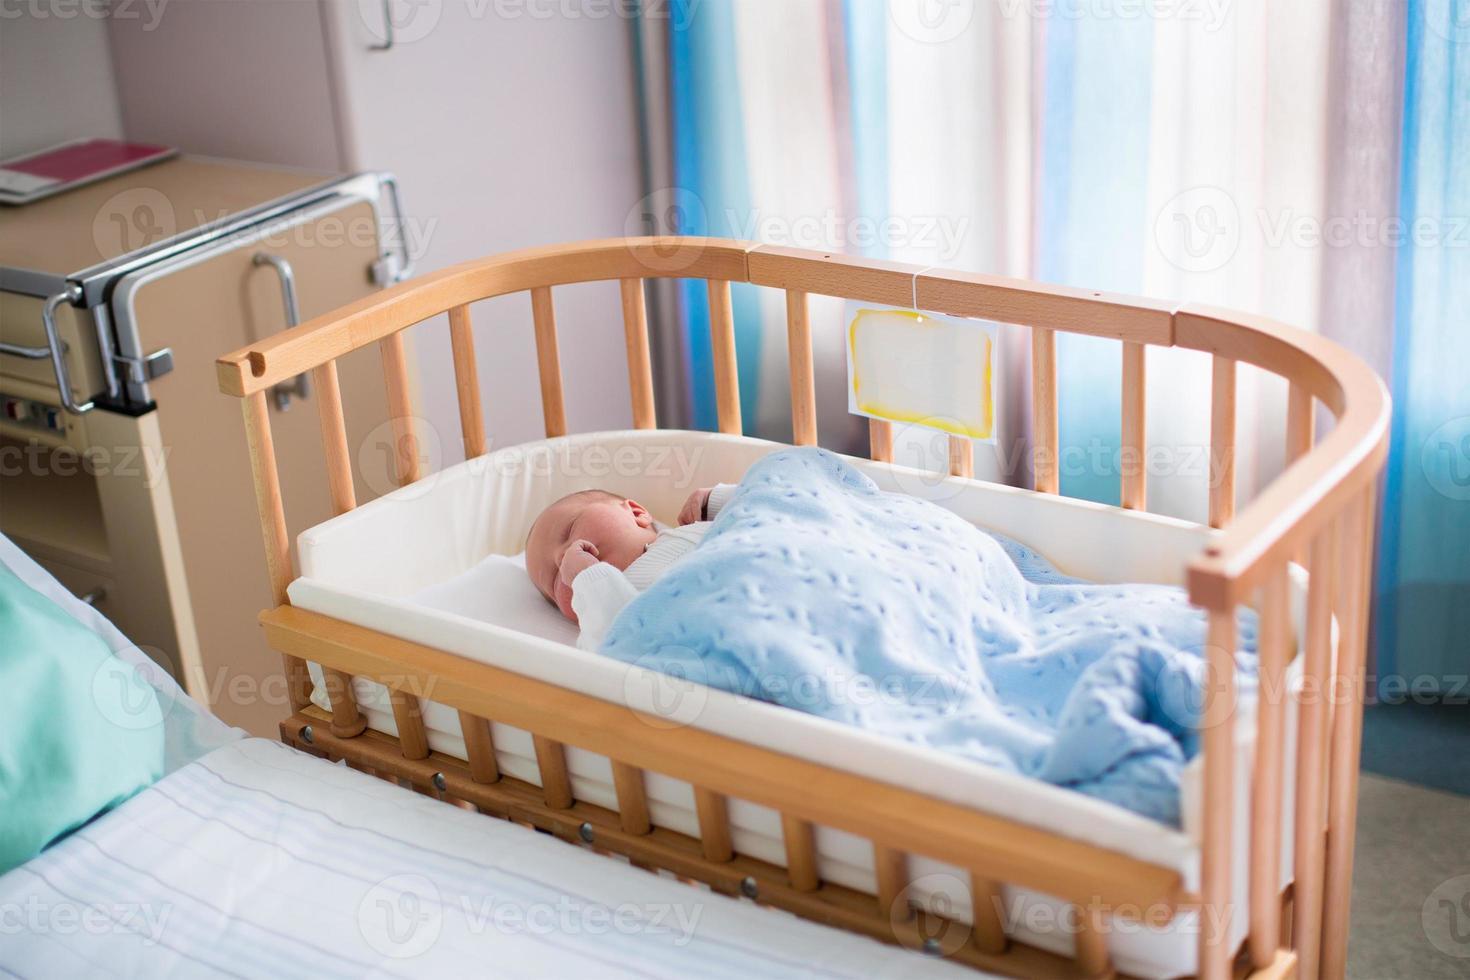 nouveau-né, garçon, hôpital, lit bébé photo